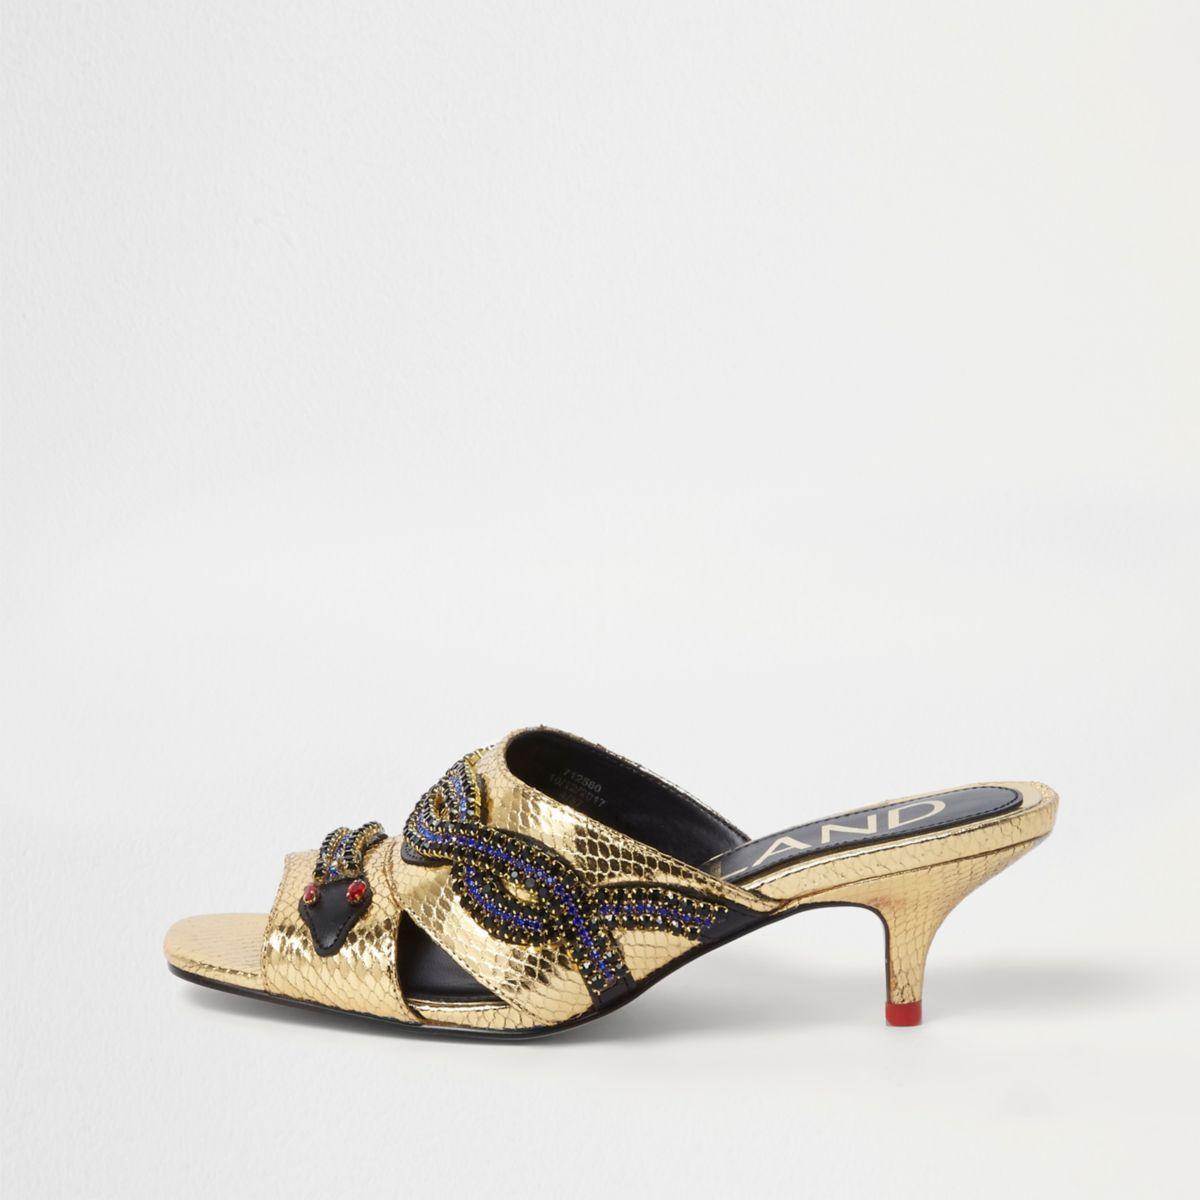 Gold Snake Embellished Kitten Heel Mules Boot Shoes Women Shoe Boots Metallic Gold Shoes